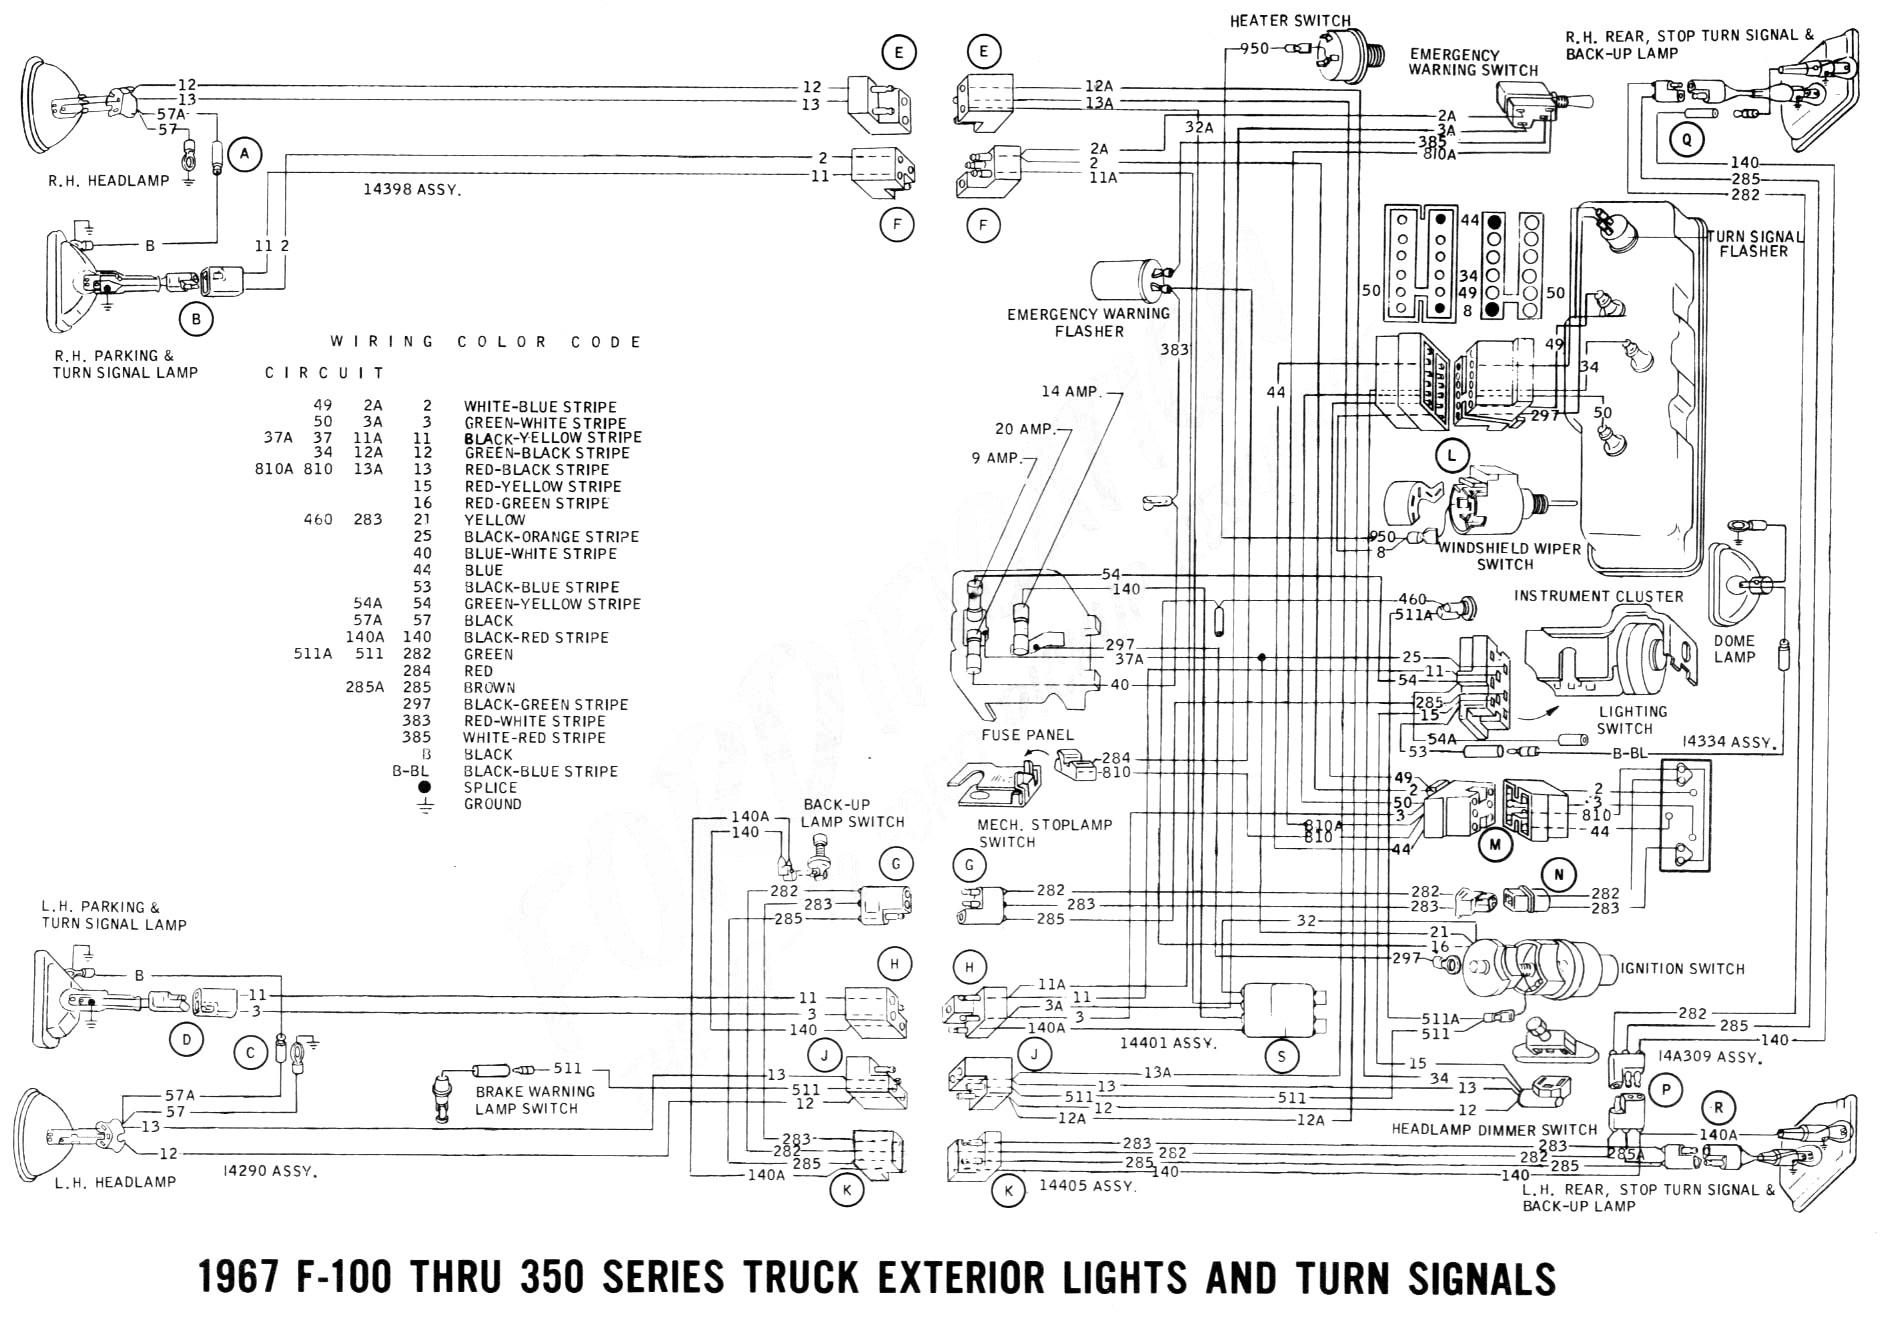 Motorcycle Wiring Diagram Pdf Elegant Image Bmw Diagrams Ford F350 1986 Ignition Rh Residentevil Me E36